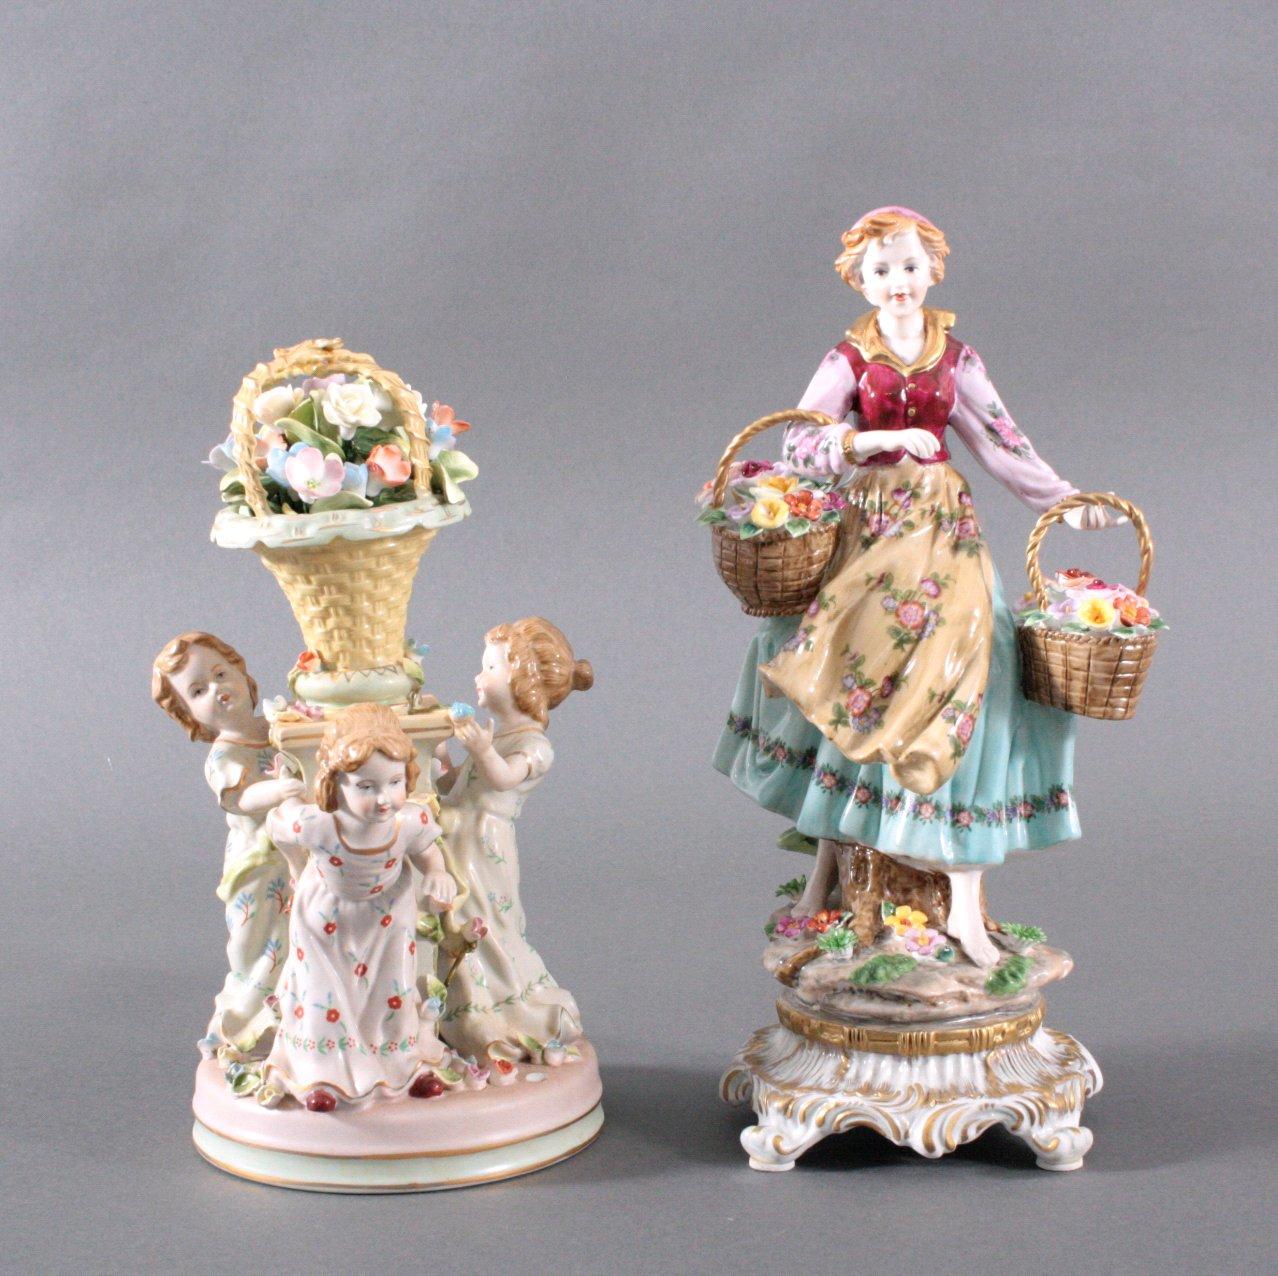 2 Porzellanskulpturen, Fanatsiemarken